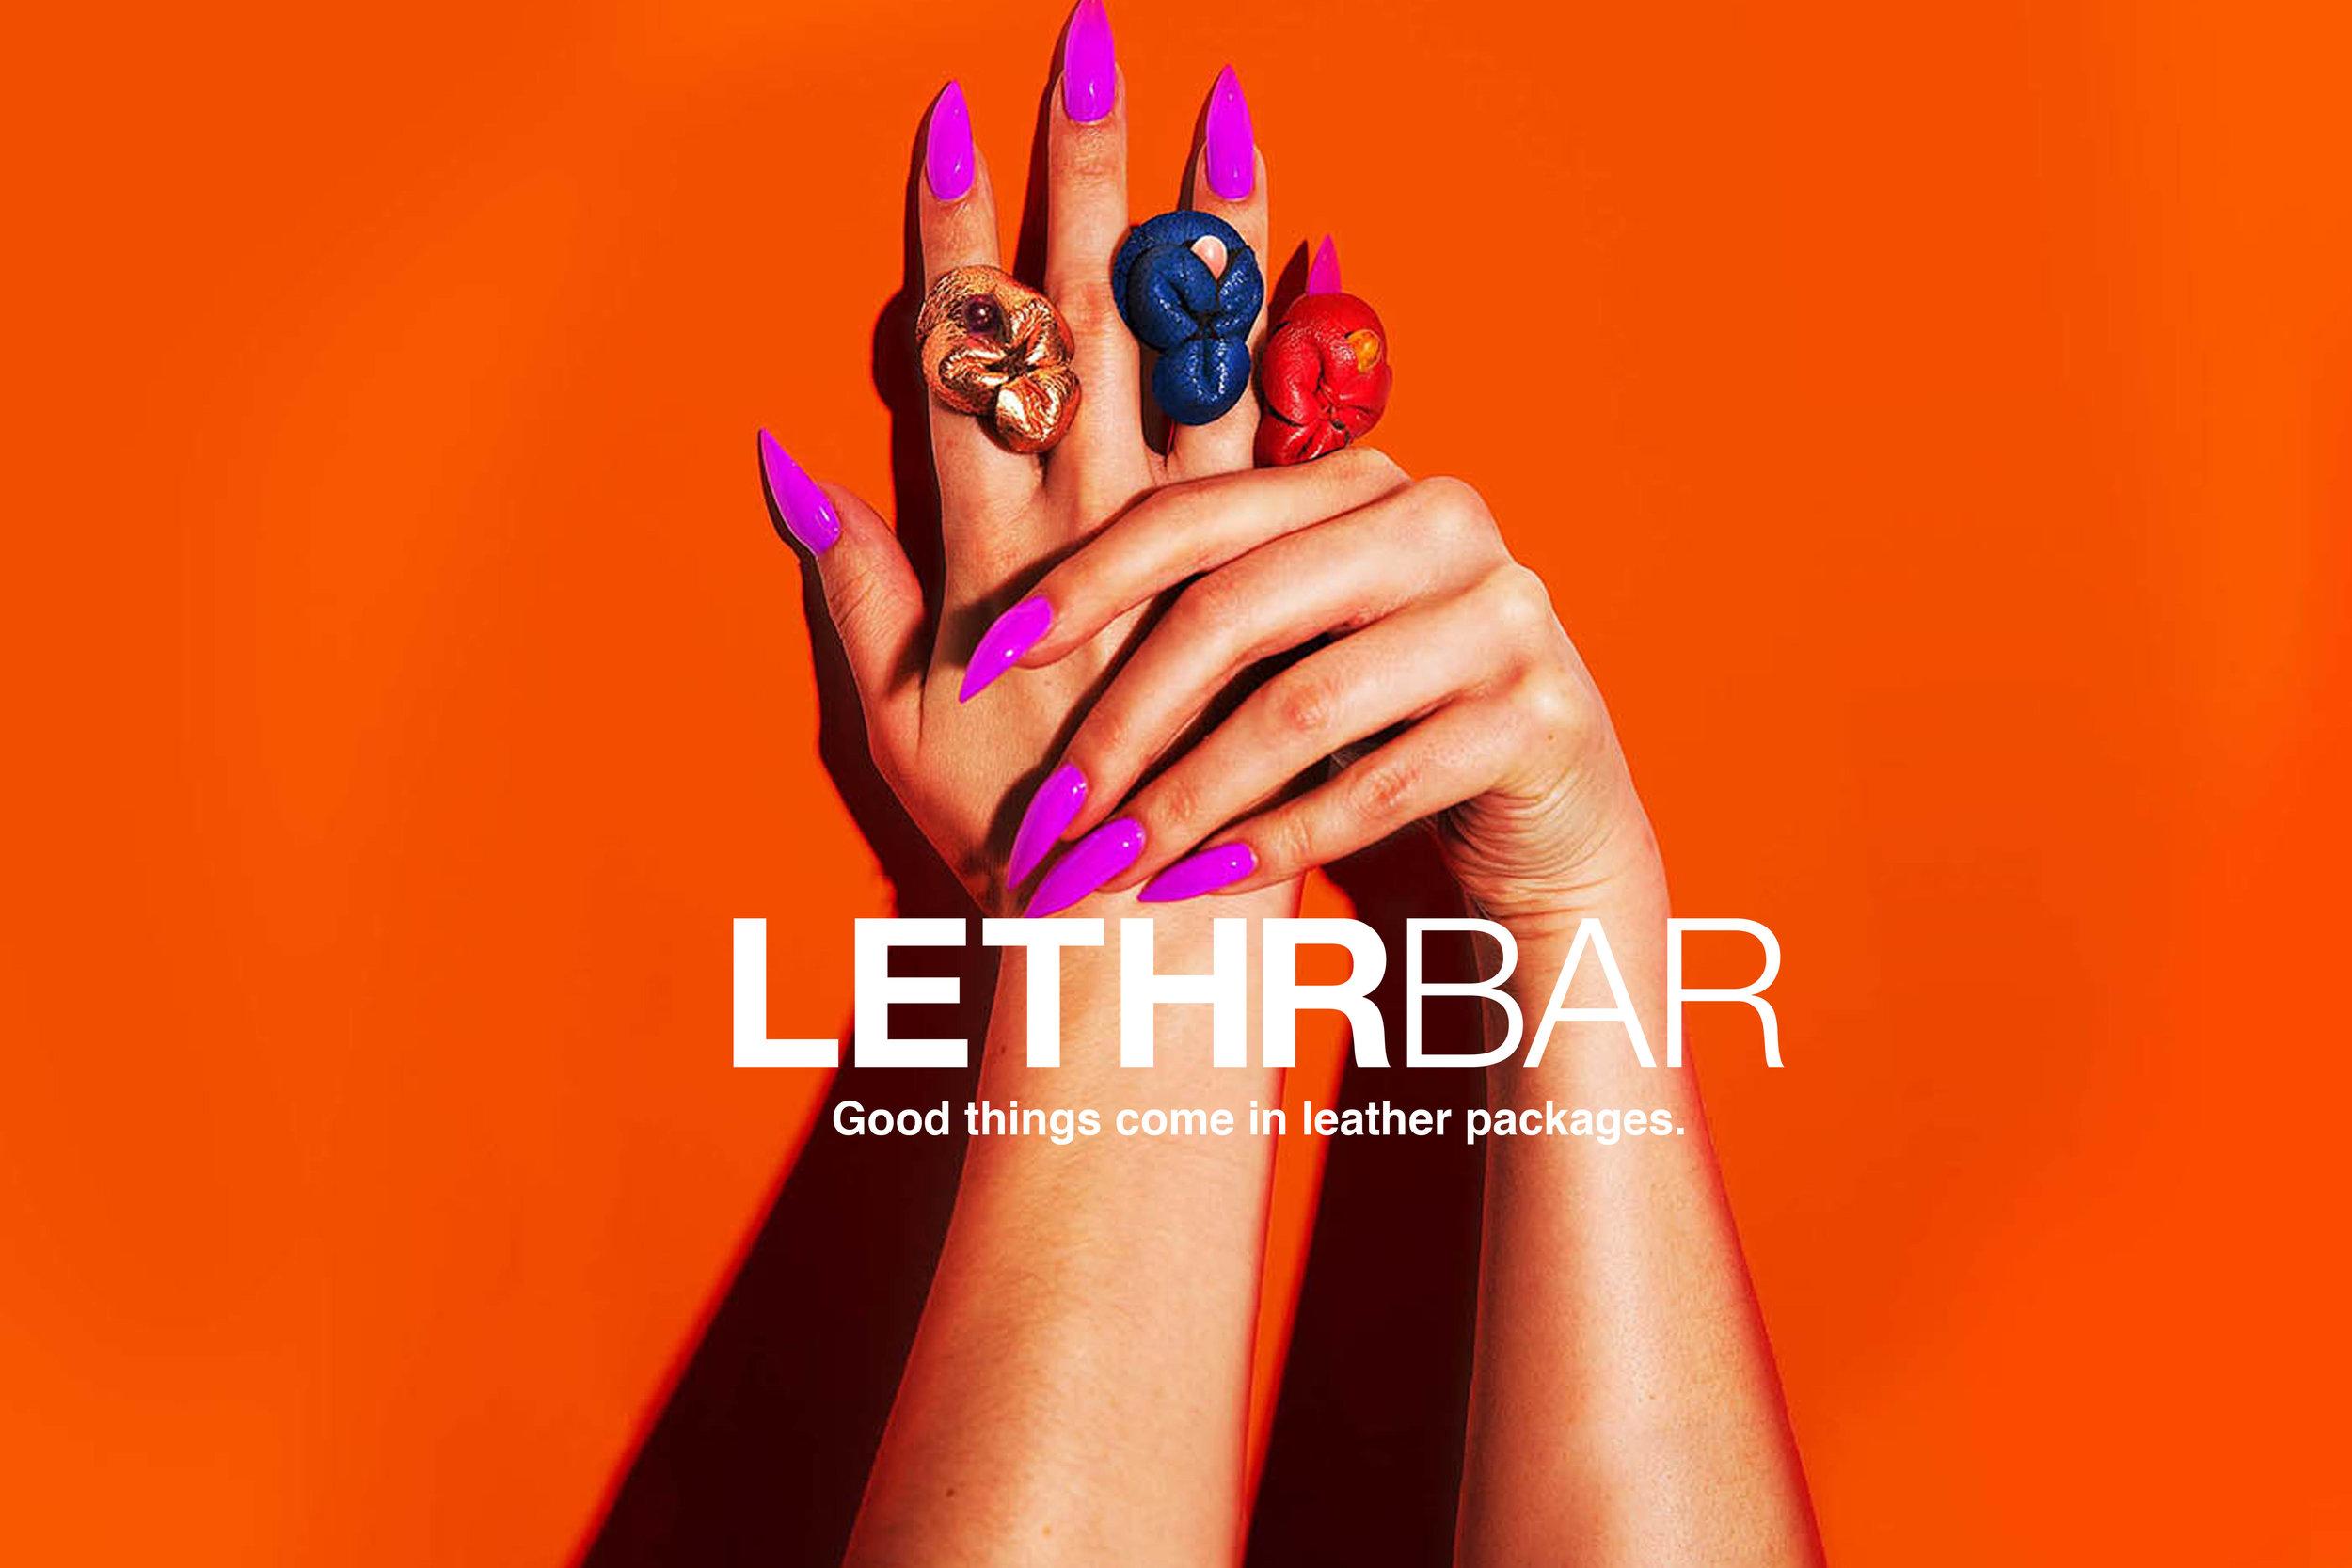 LETHRBAR1.jpg